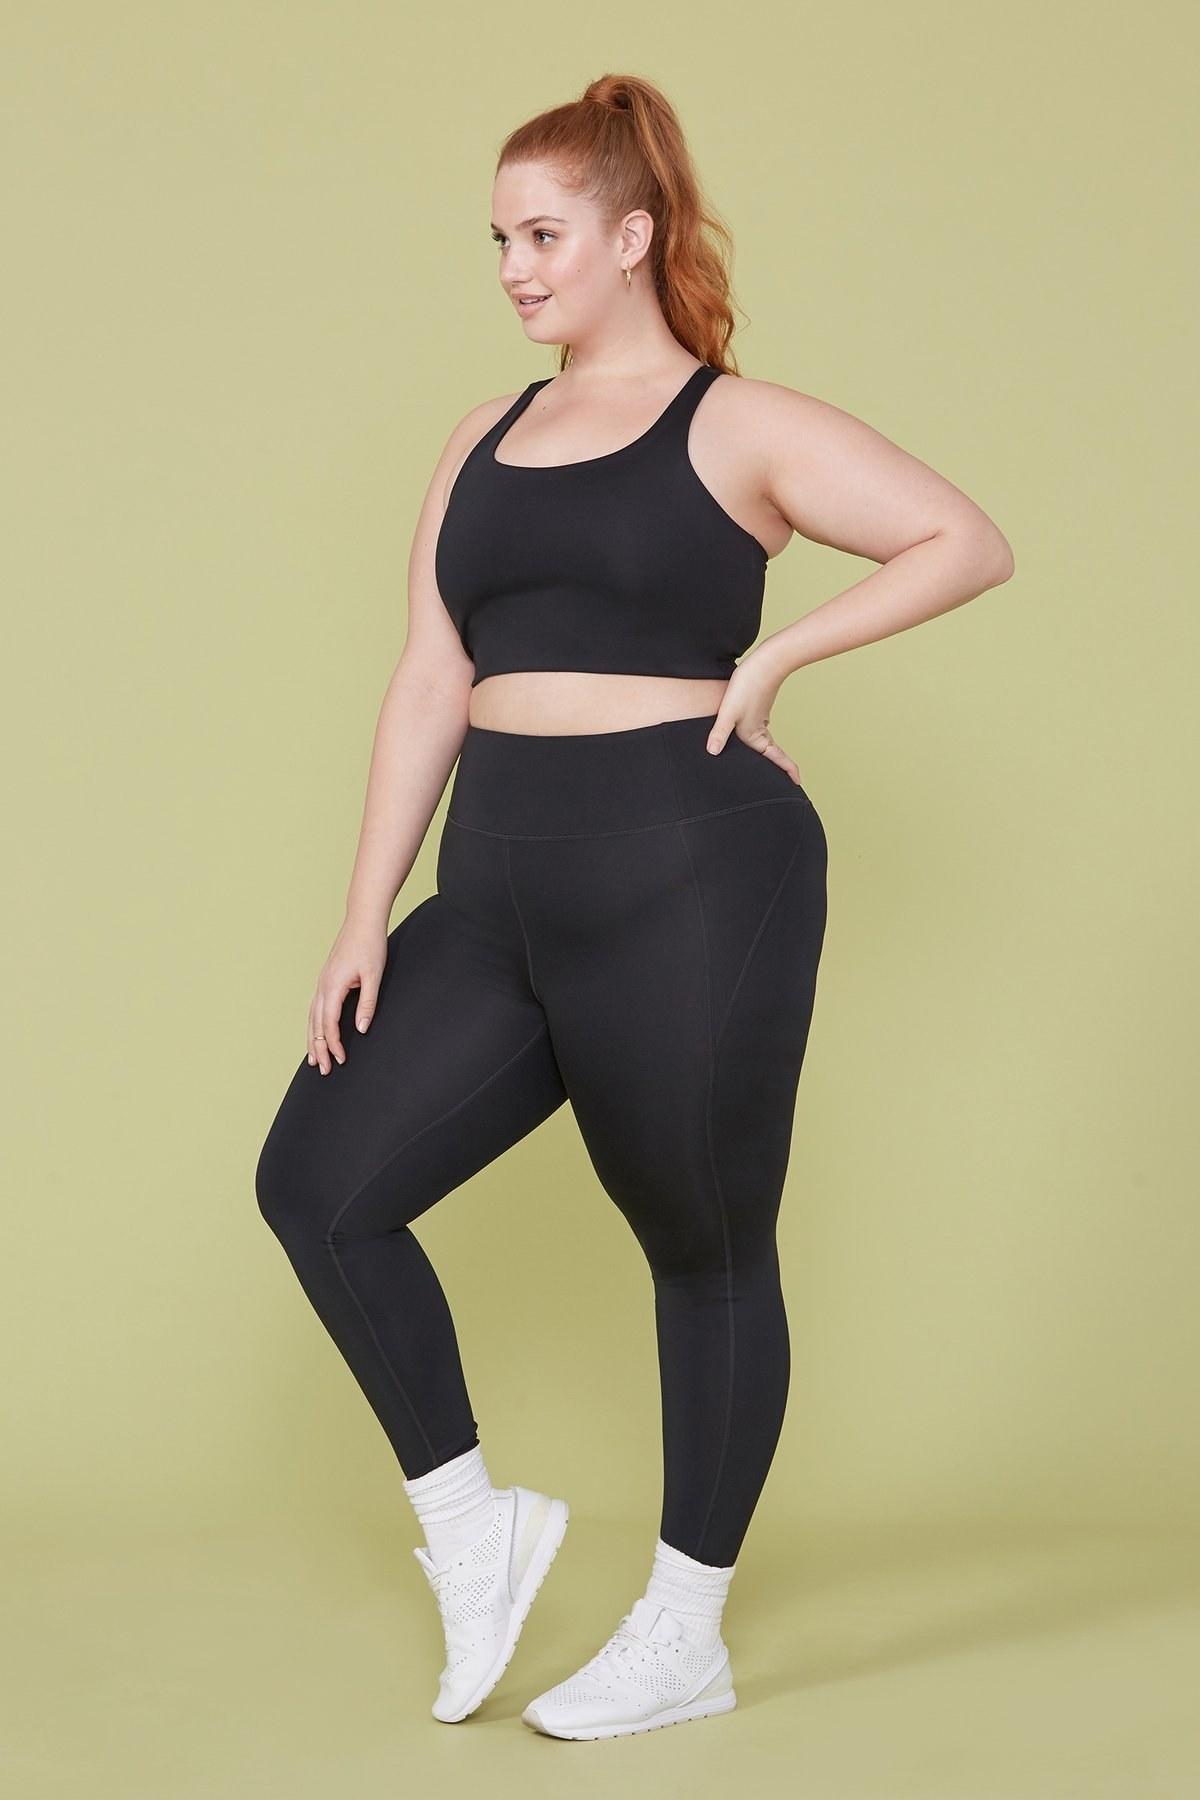 model wearing the high-waist stretch leggings in black